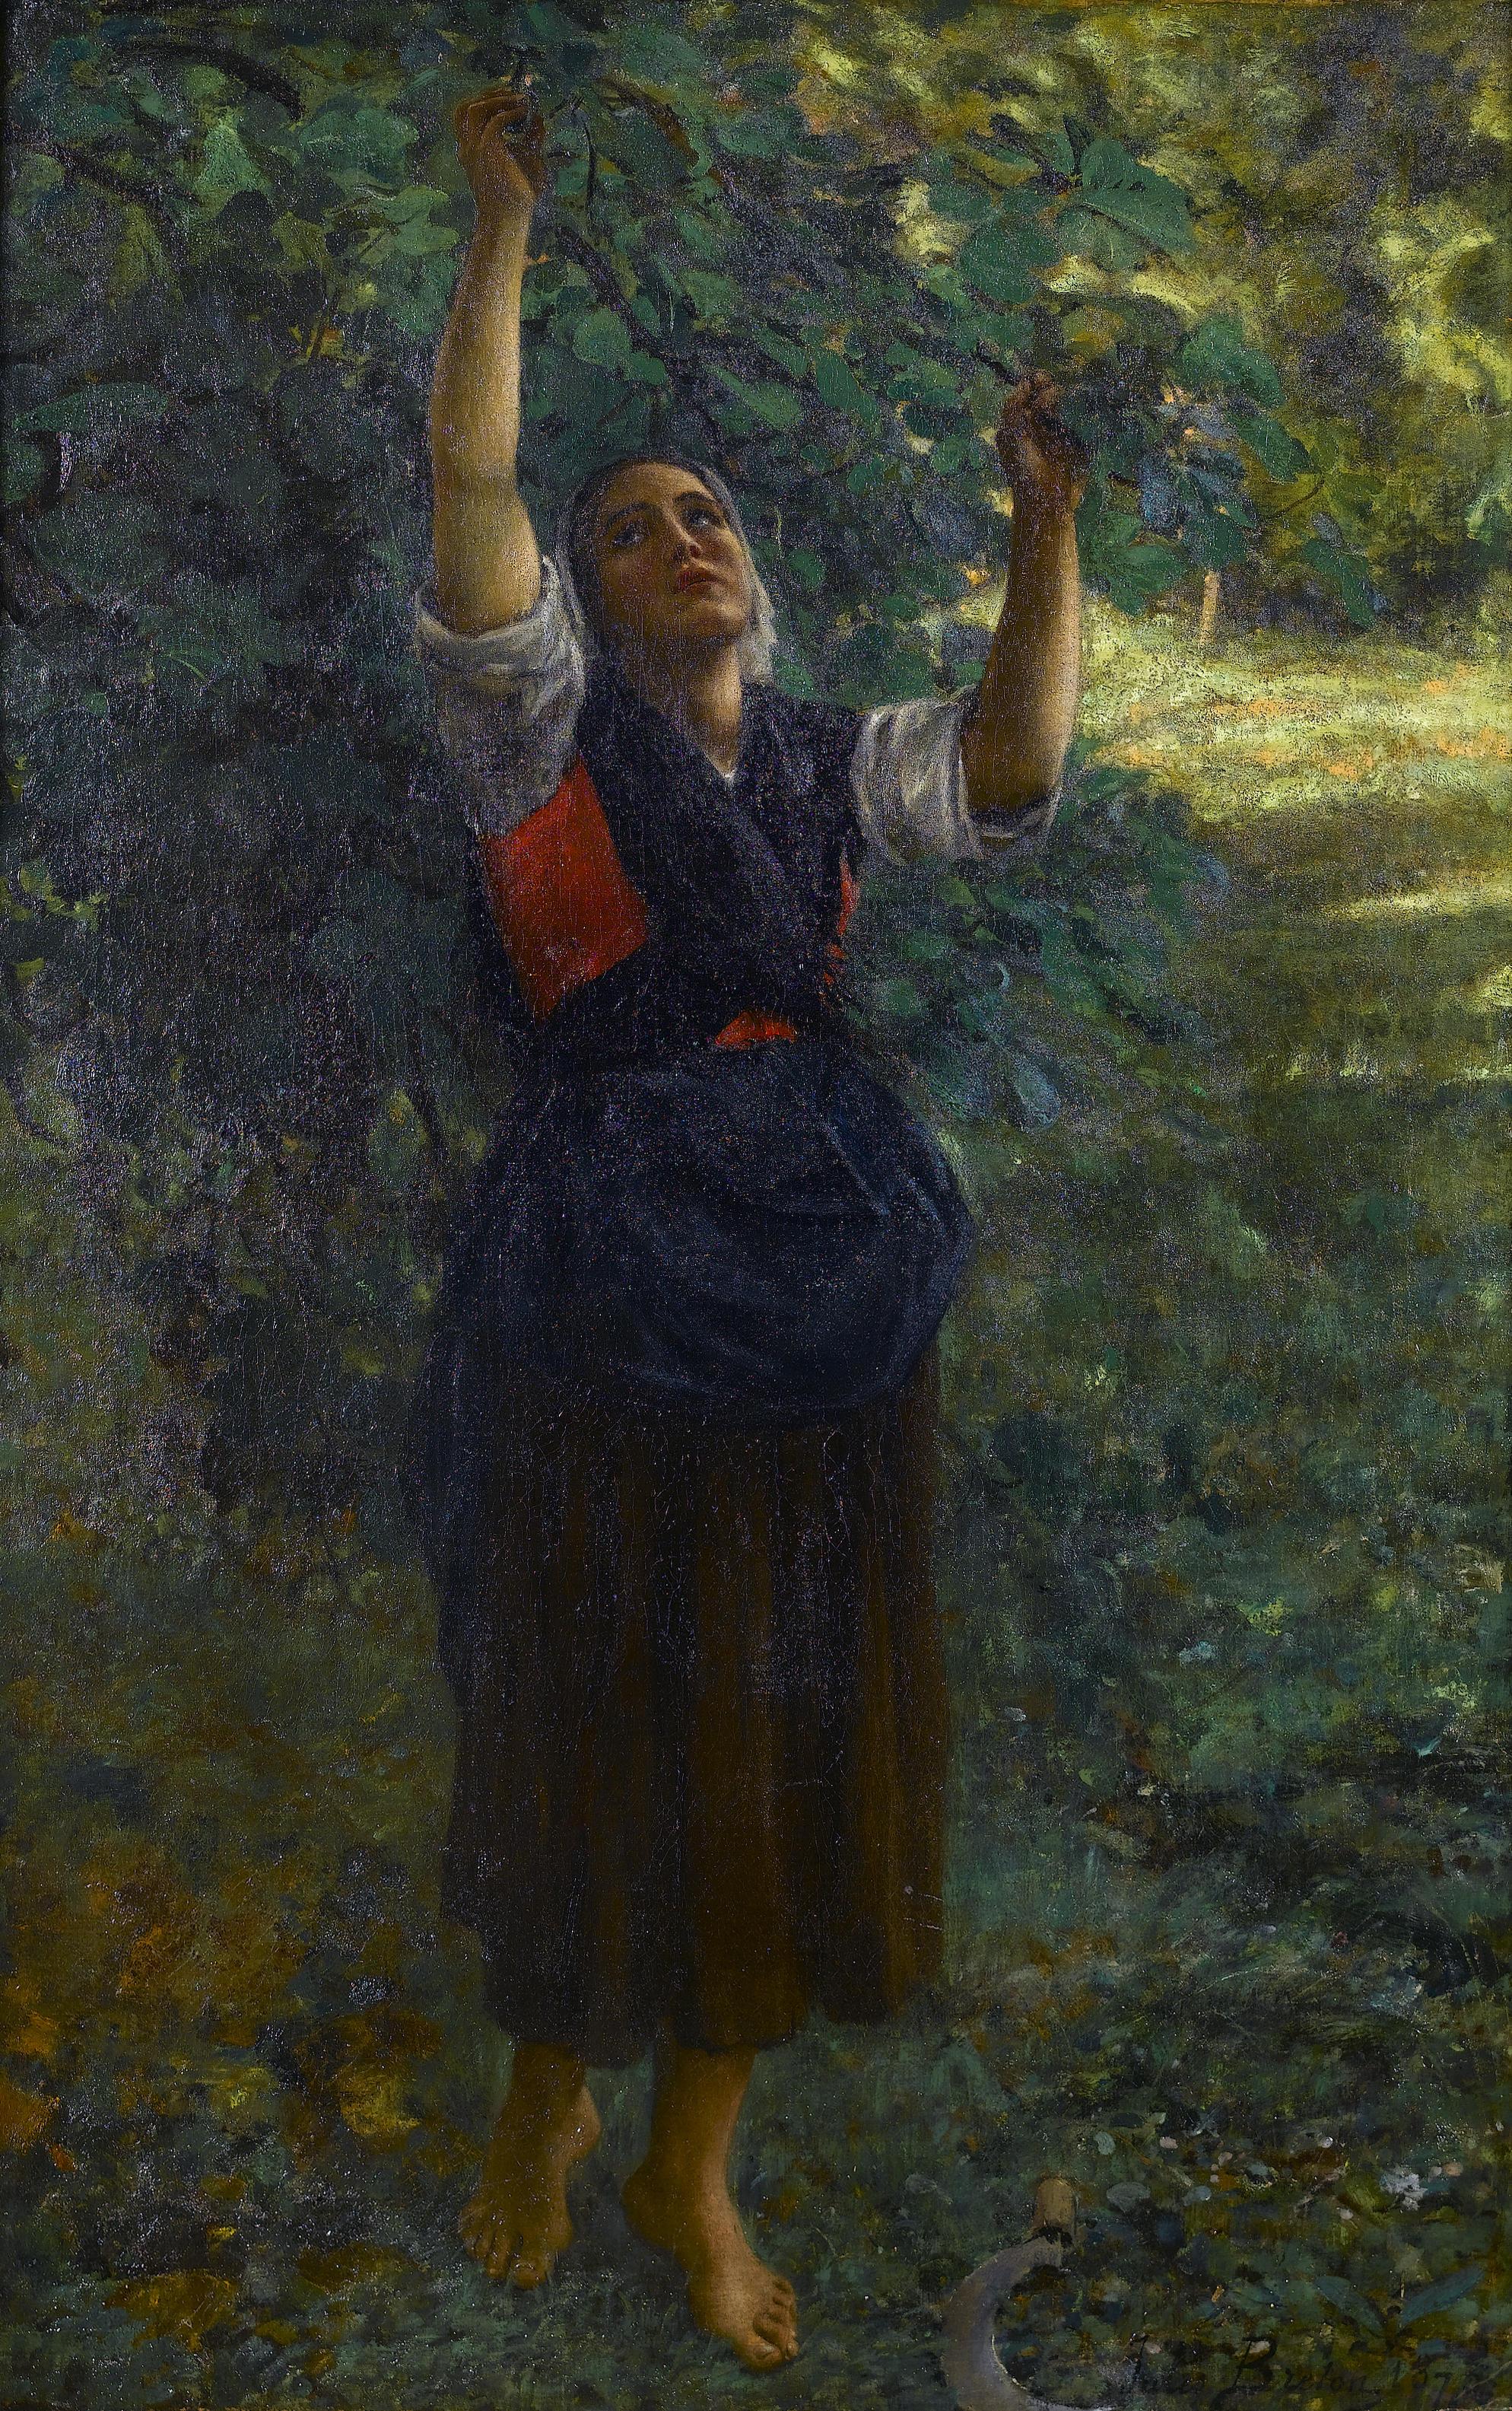 File:Jules Breton - Cueilleuse de figues.jpg - Wikimedia Commons